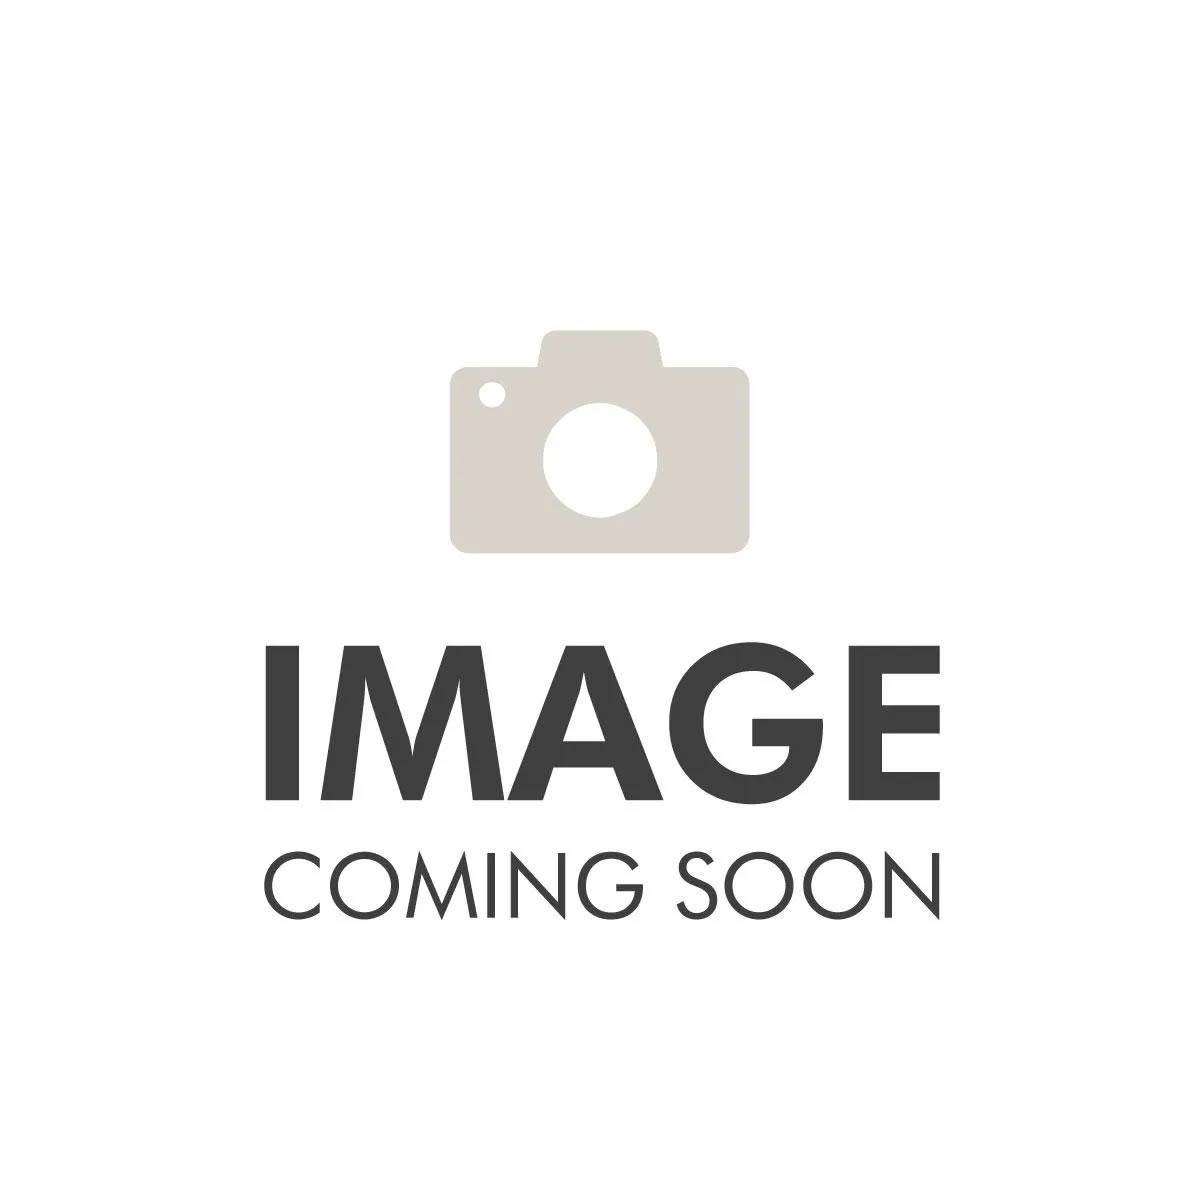 Neoprene Arm Rest Cover, Black; 07-10 Jeep Wrangler JK